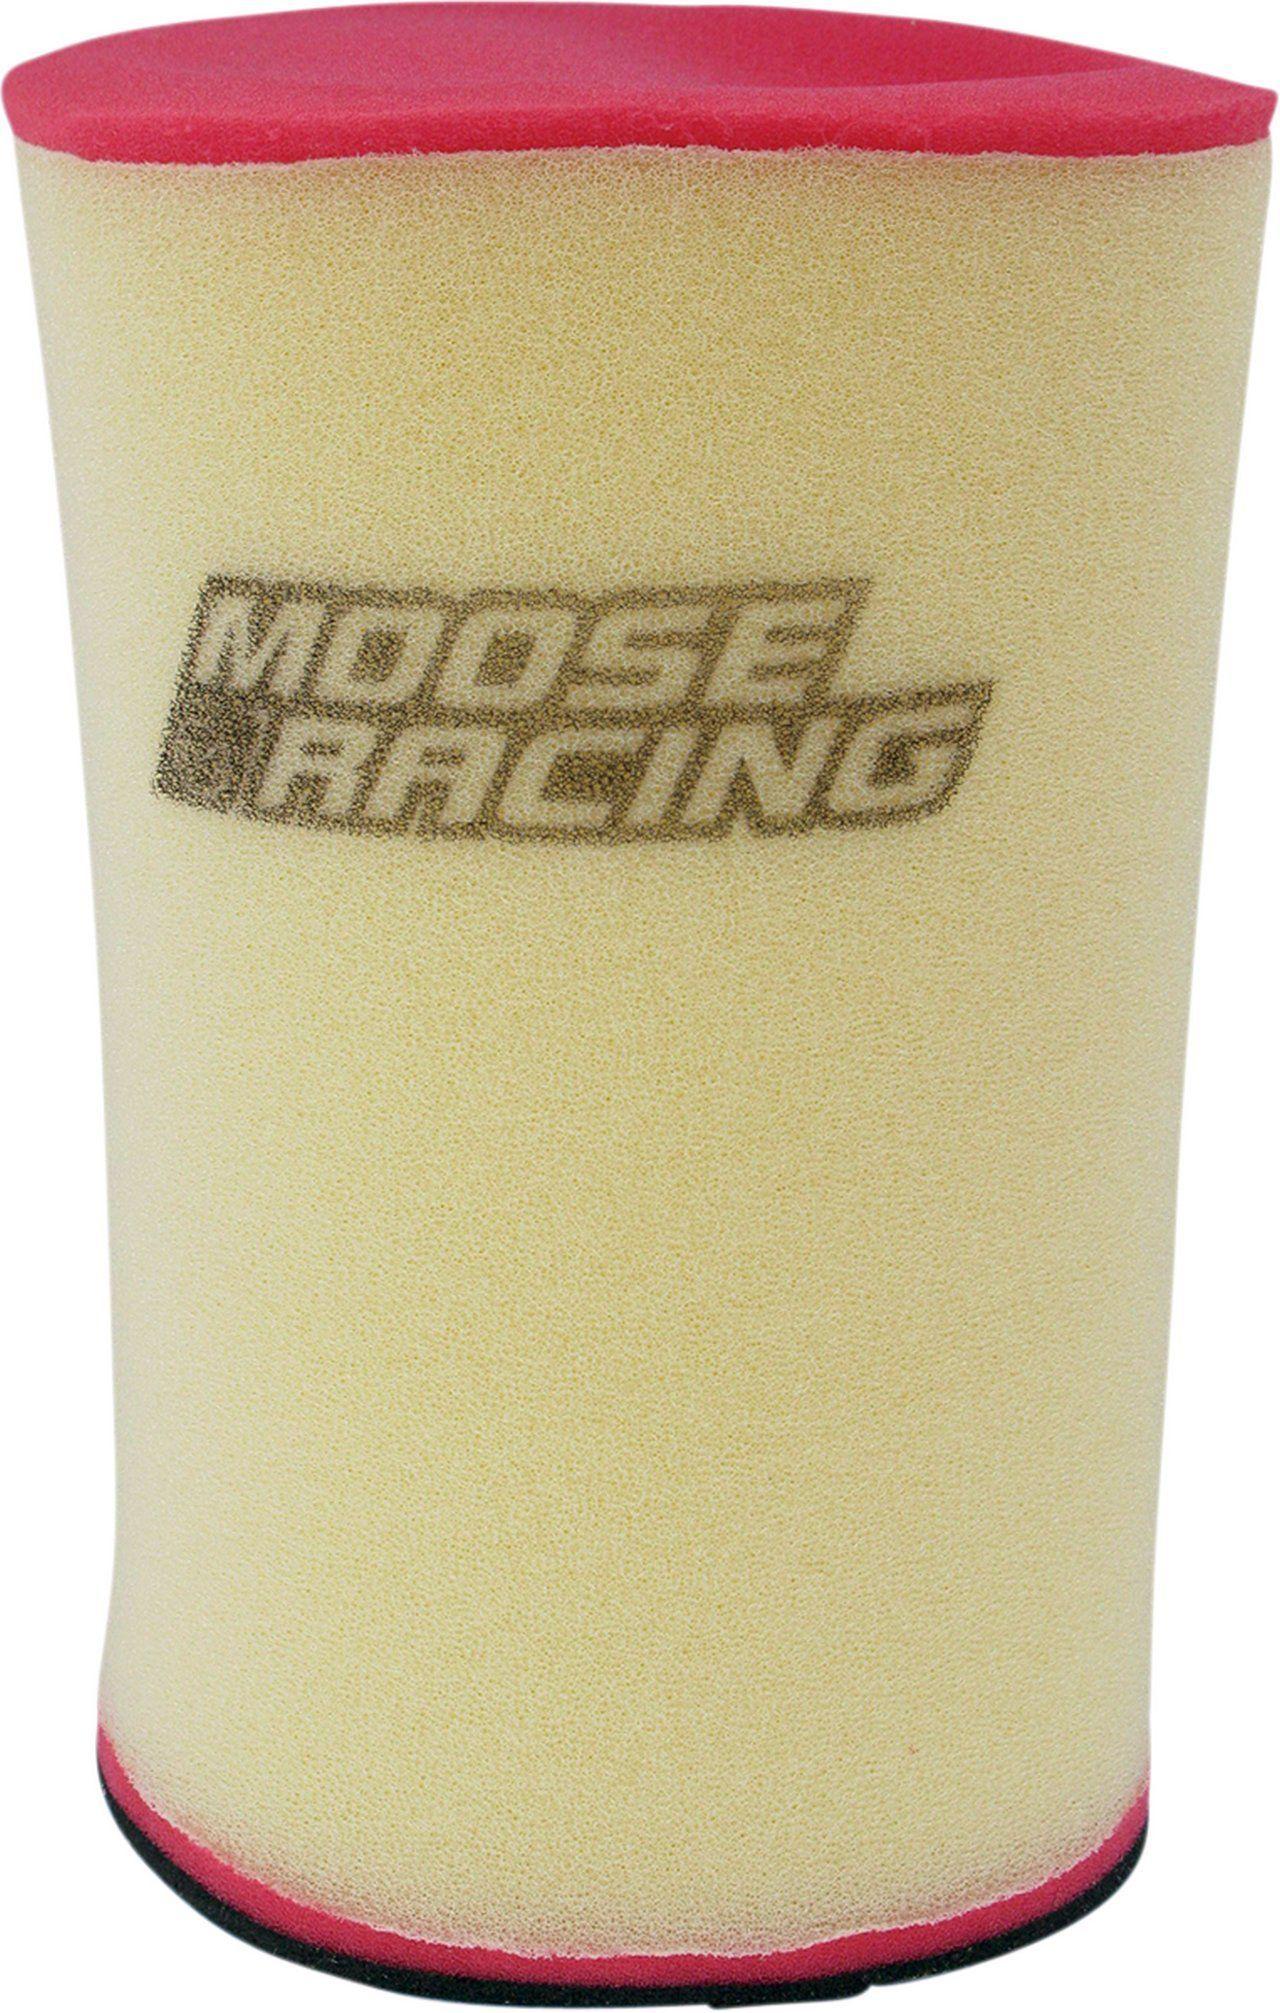 【MOOSE RACING】PPO (PRECISION PRE-OILED) 空氣濾芯 [1011-1377] - 「Webike-摩托百貨」